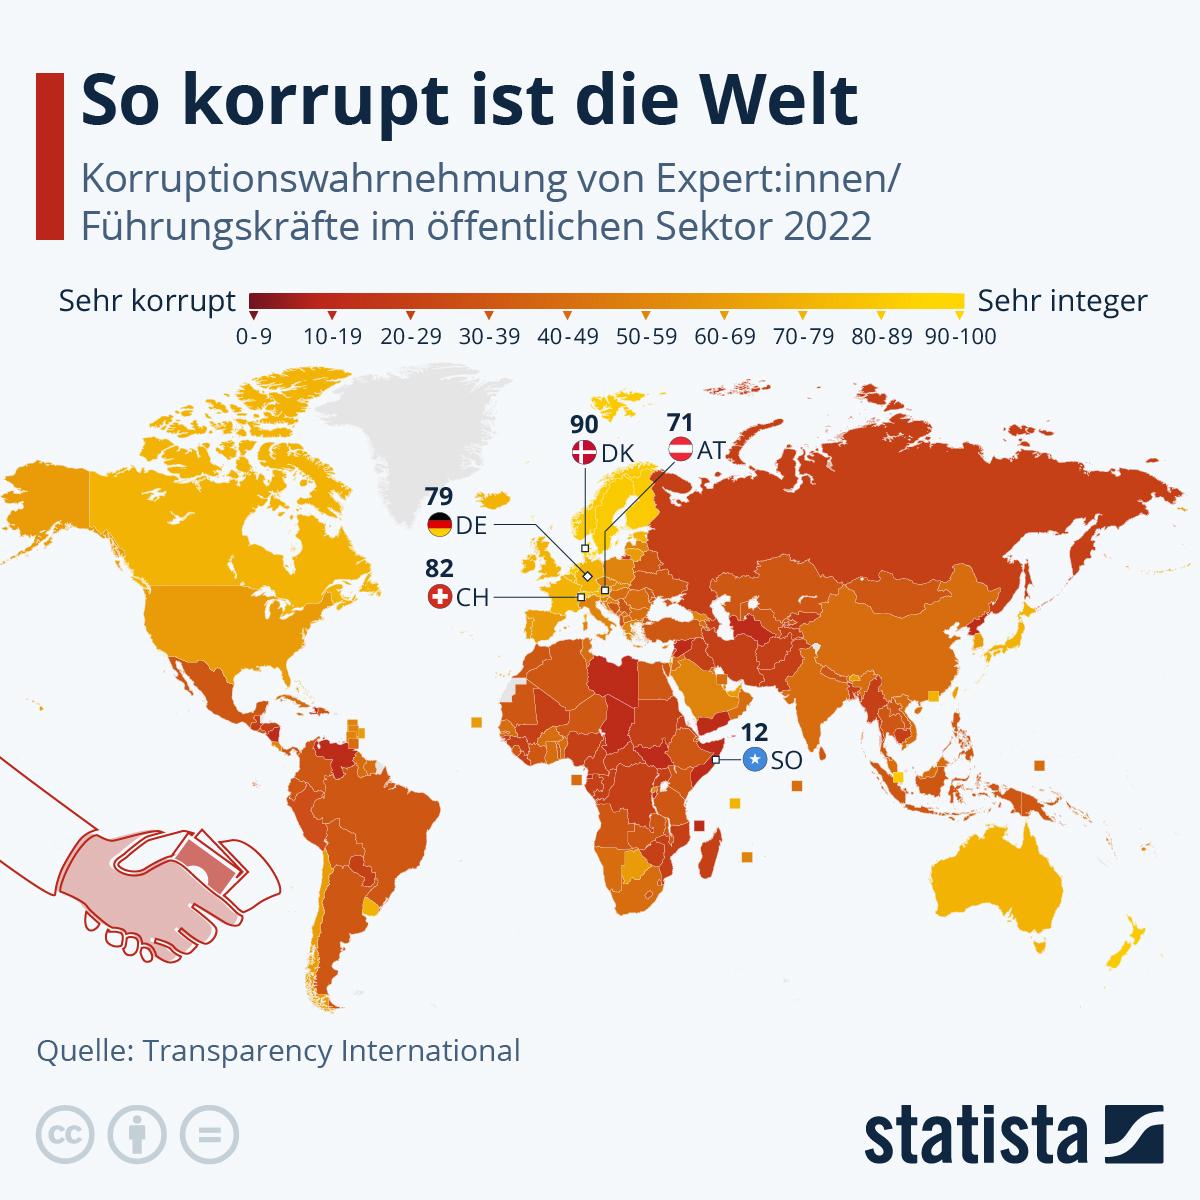 So korrupt ist die Welt | Statista